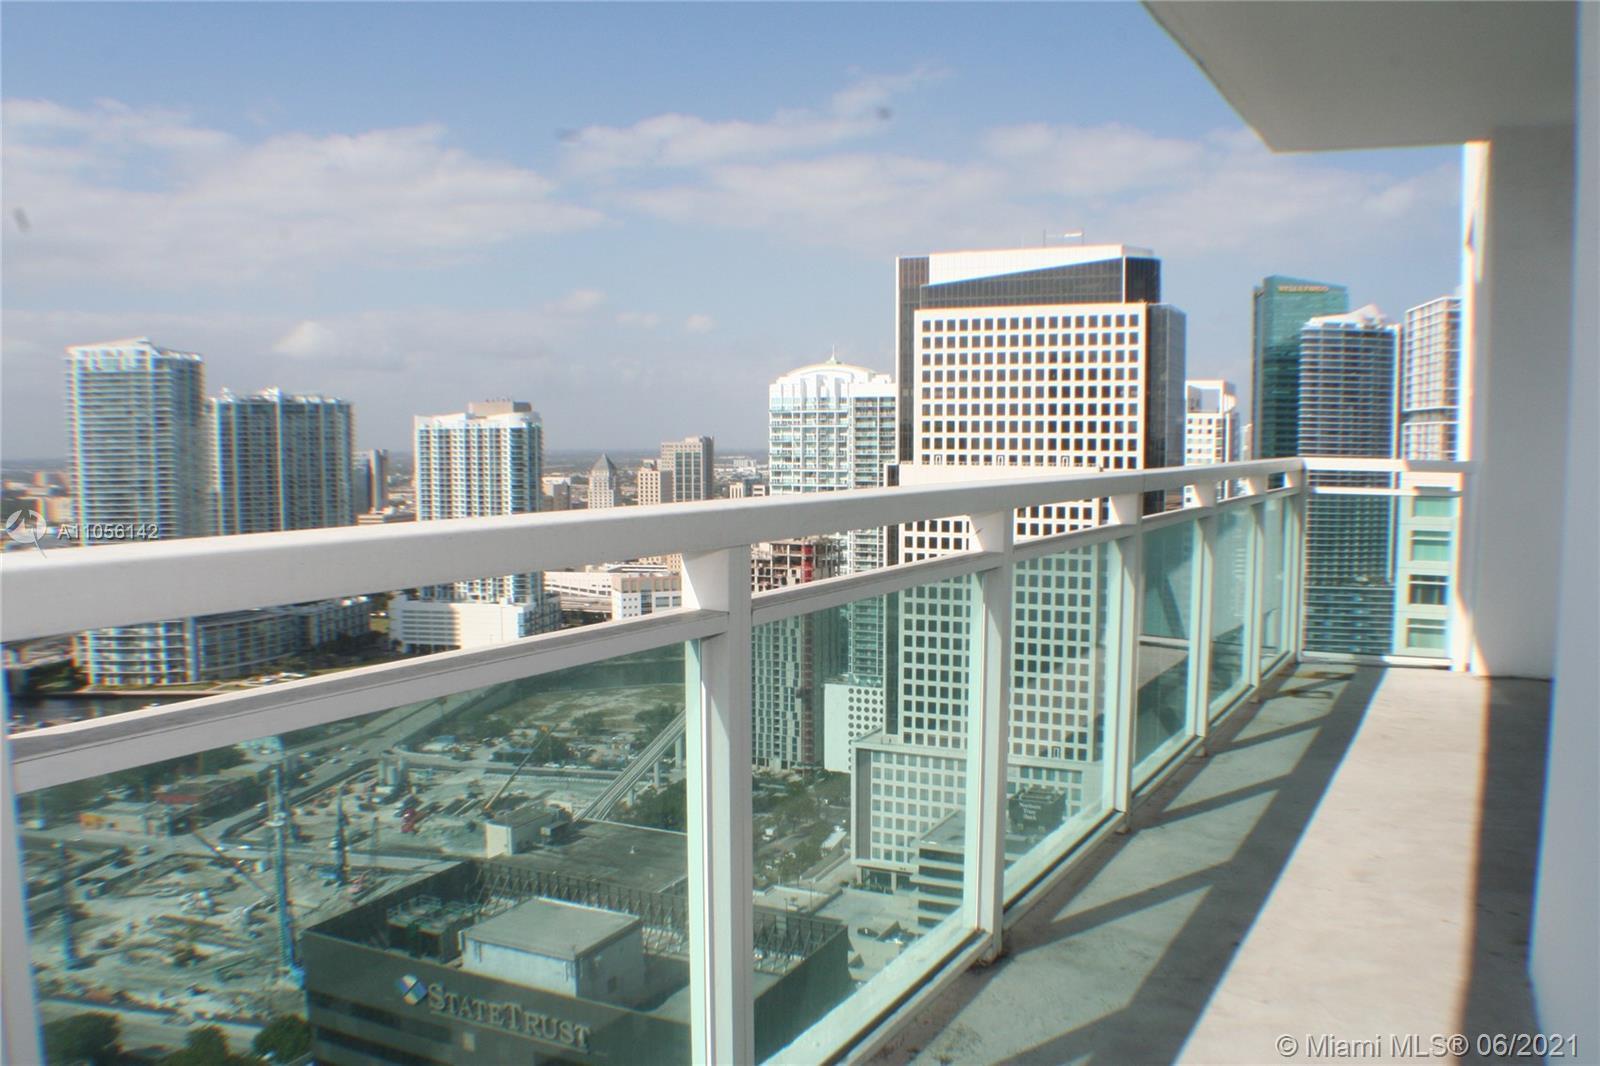 Great City View!! Wood Floors. 1120 sq ft. 2 beds 2 bath. Excellent Condition!!! Unit have tenants u